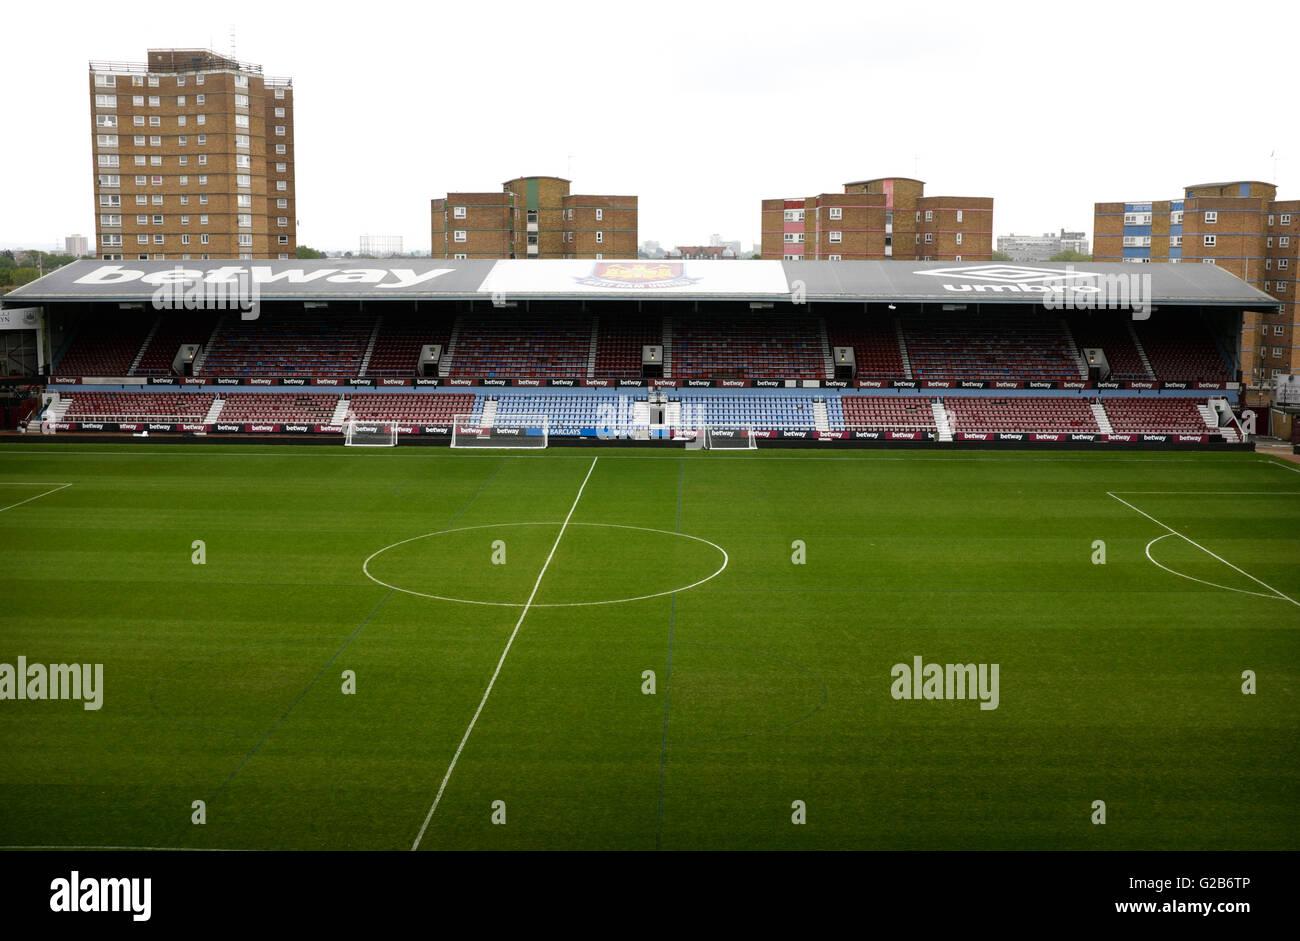 The East Stand, The Boleyn Ground, Upton Park, West Ham, London - Stock Image